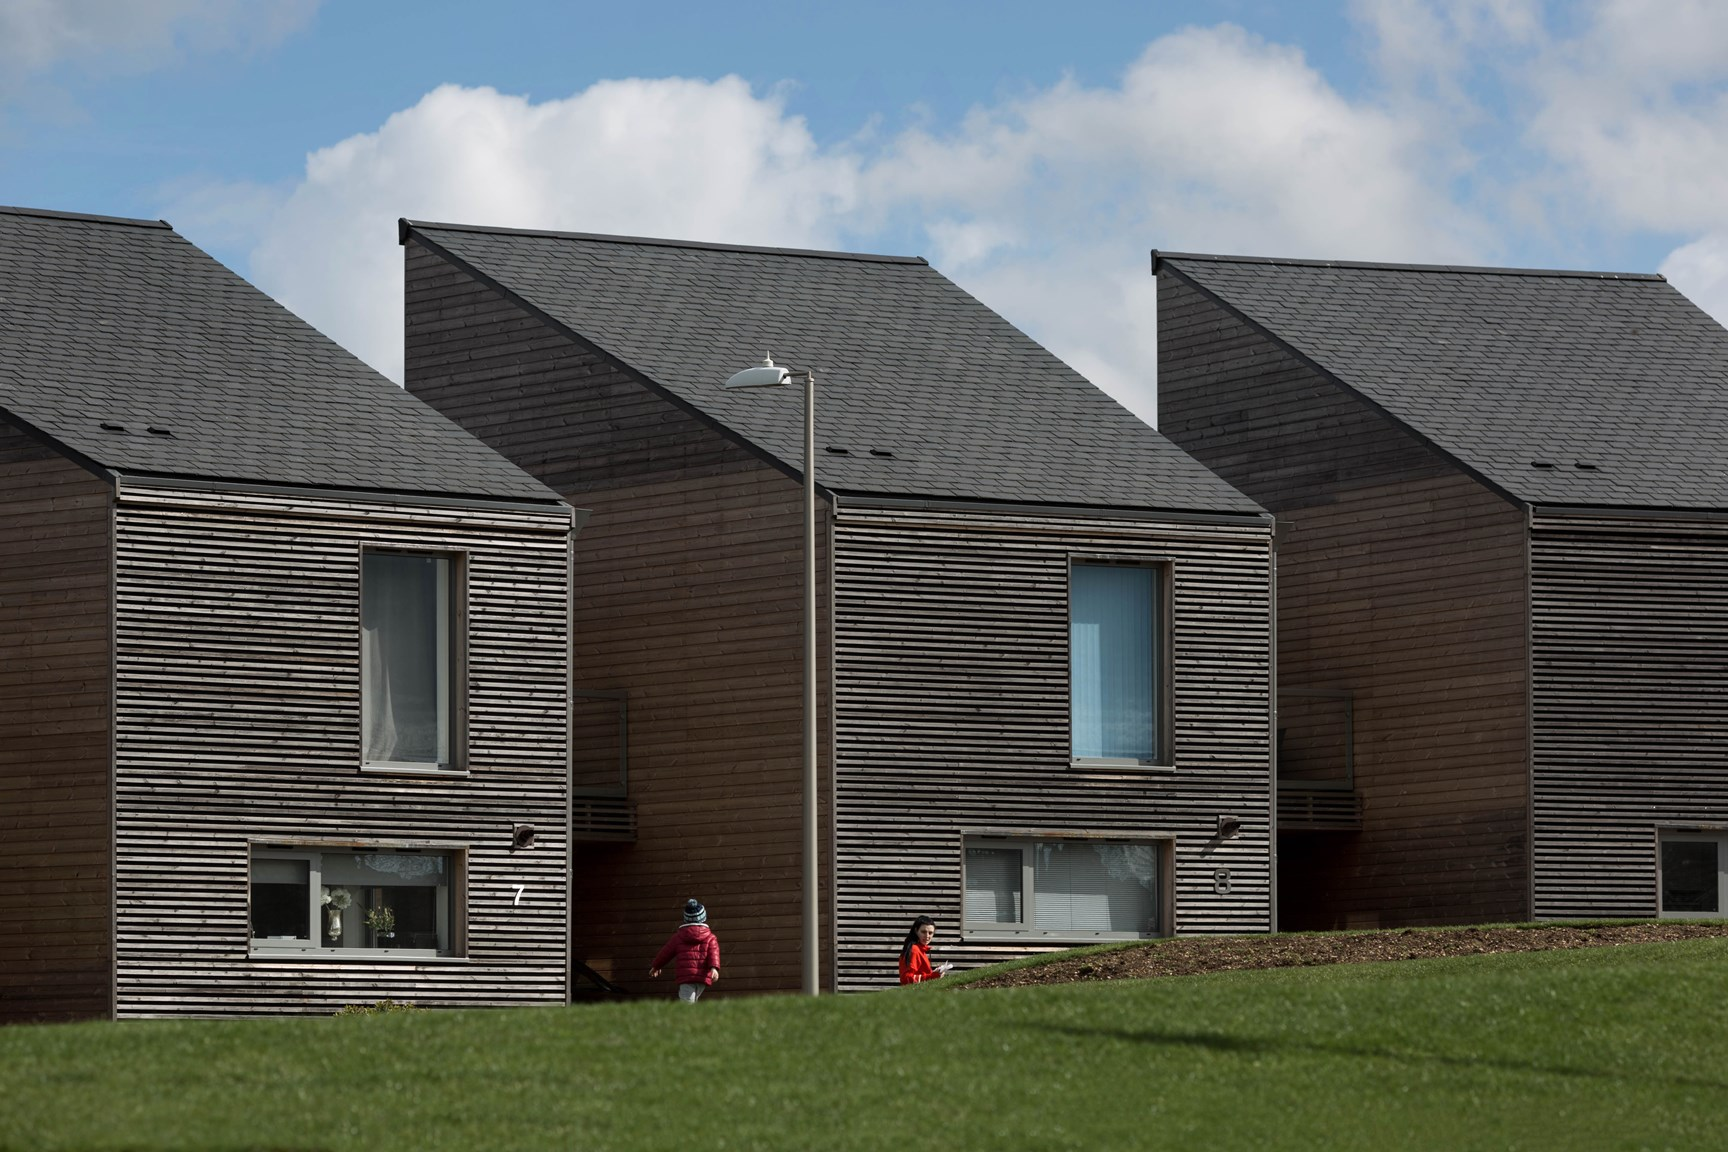 Newhall houses